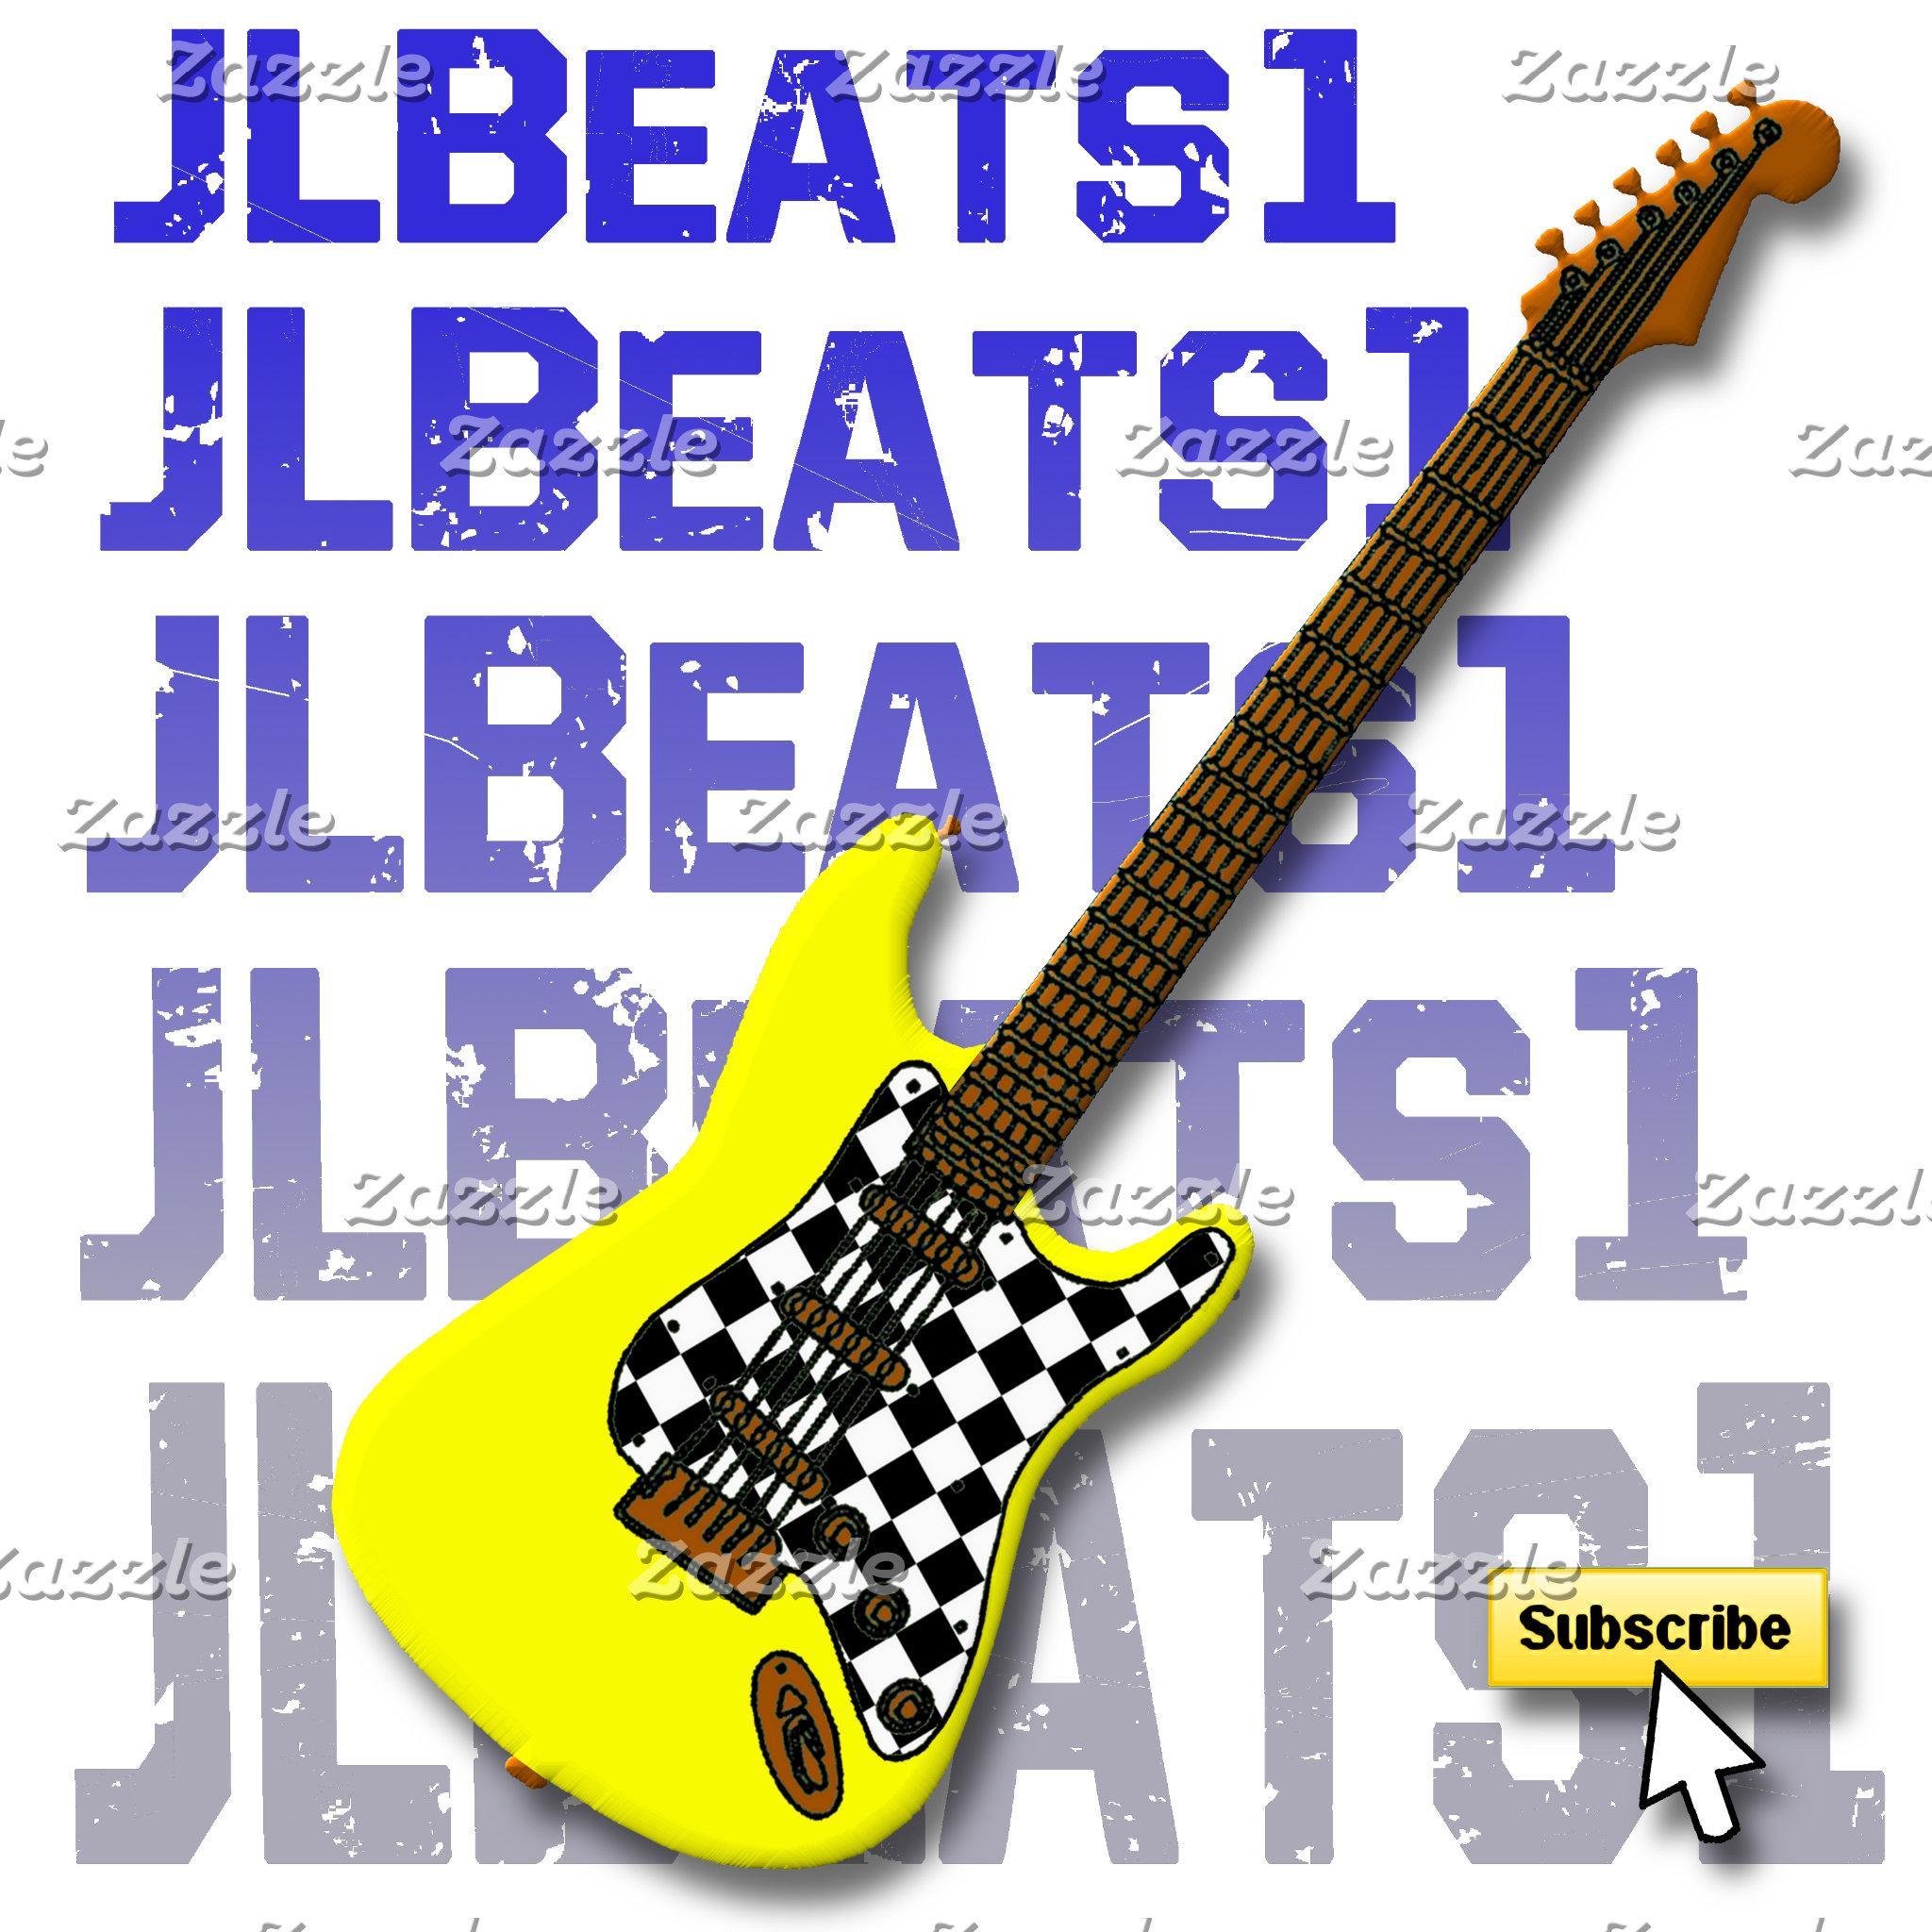 JLBEATS1 Yellow Guitar